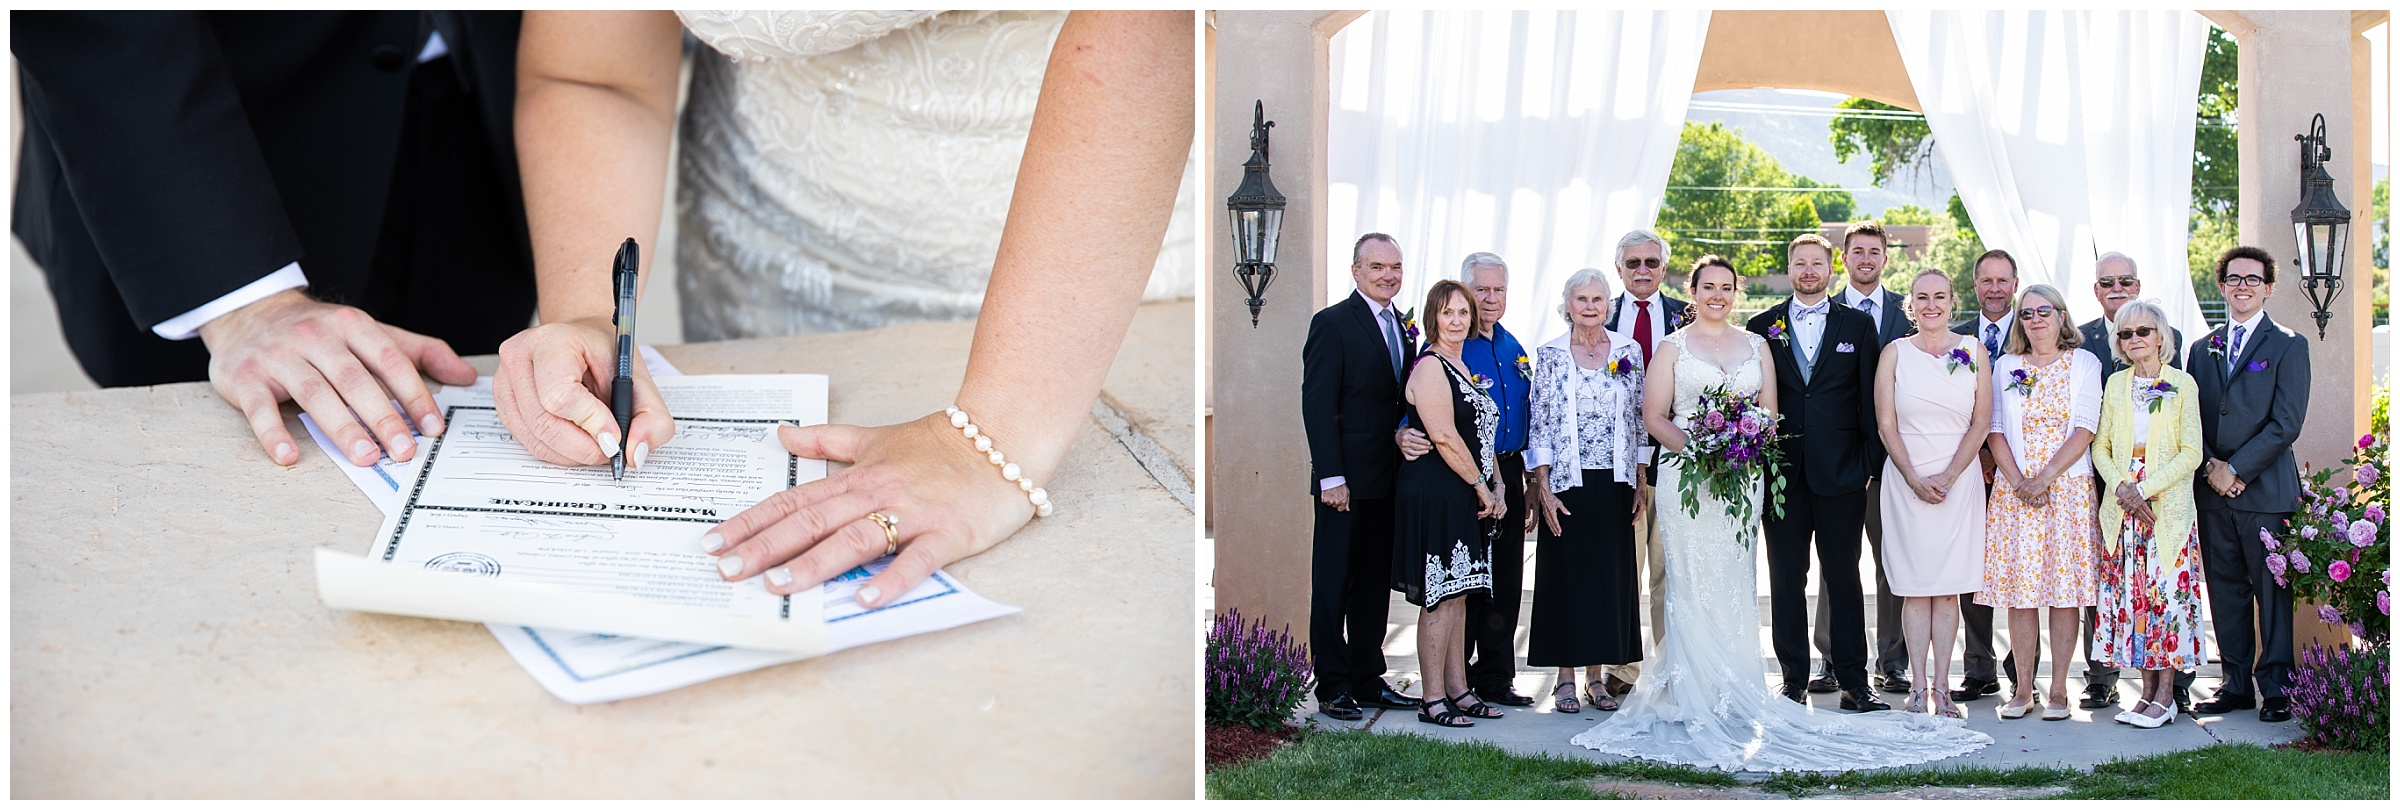 Grand Junction Wedding Photographer 0049.jpg